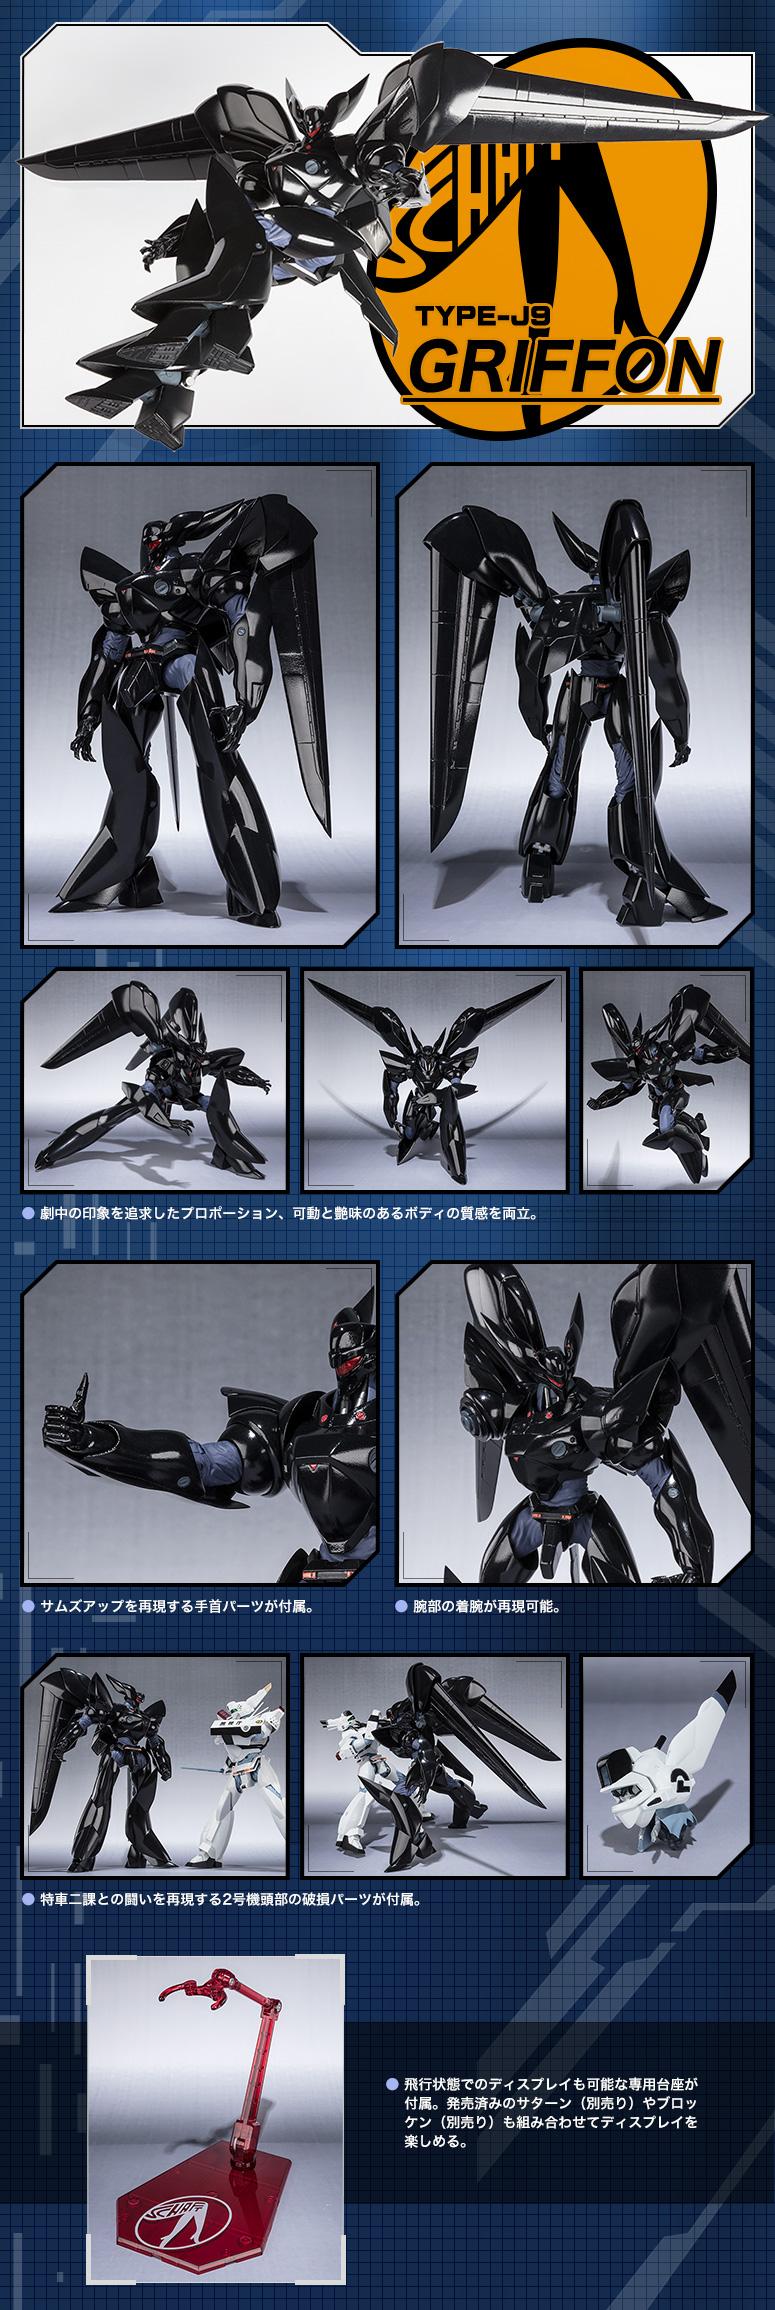 Patlabor - Robot Side Labor (Bandai) - Page 7 4fIMBkhH_o